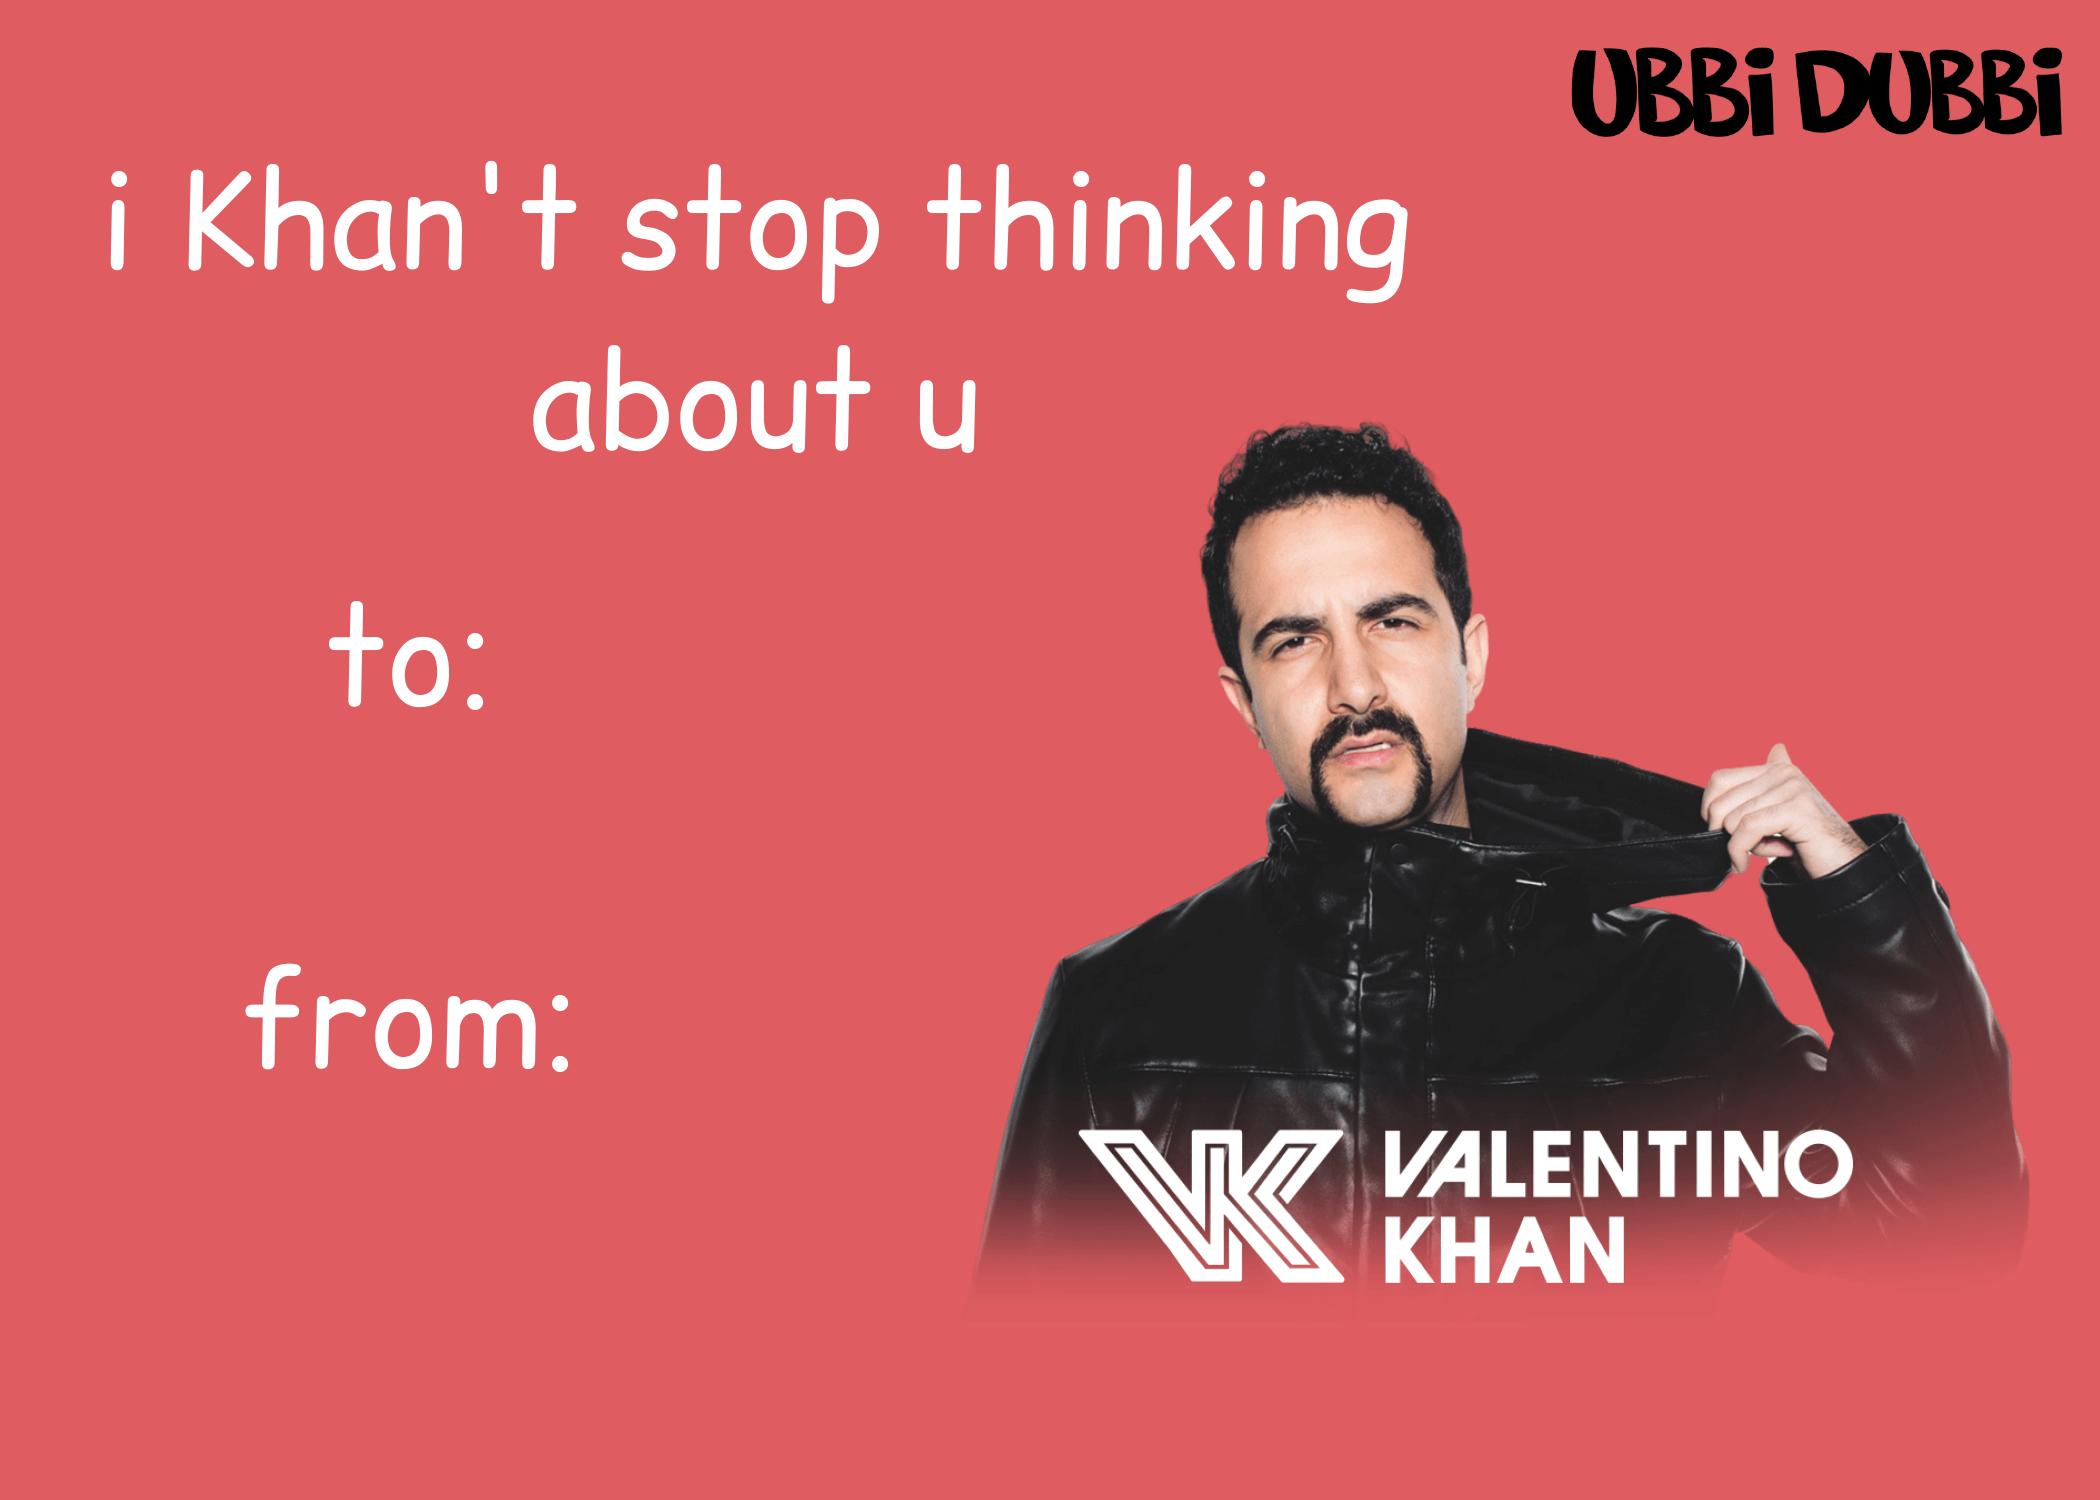 ubbi dubbi valentine's day card for valentino khan